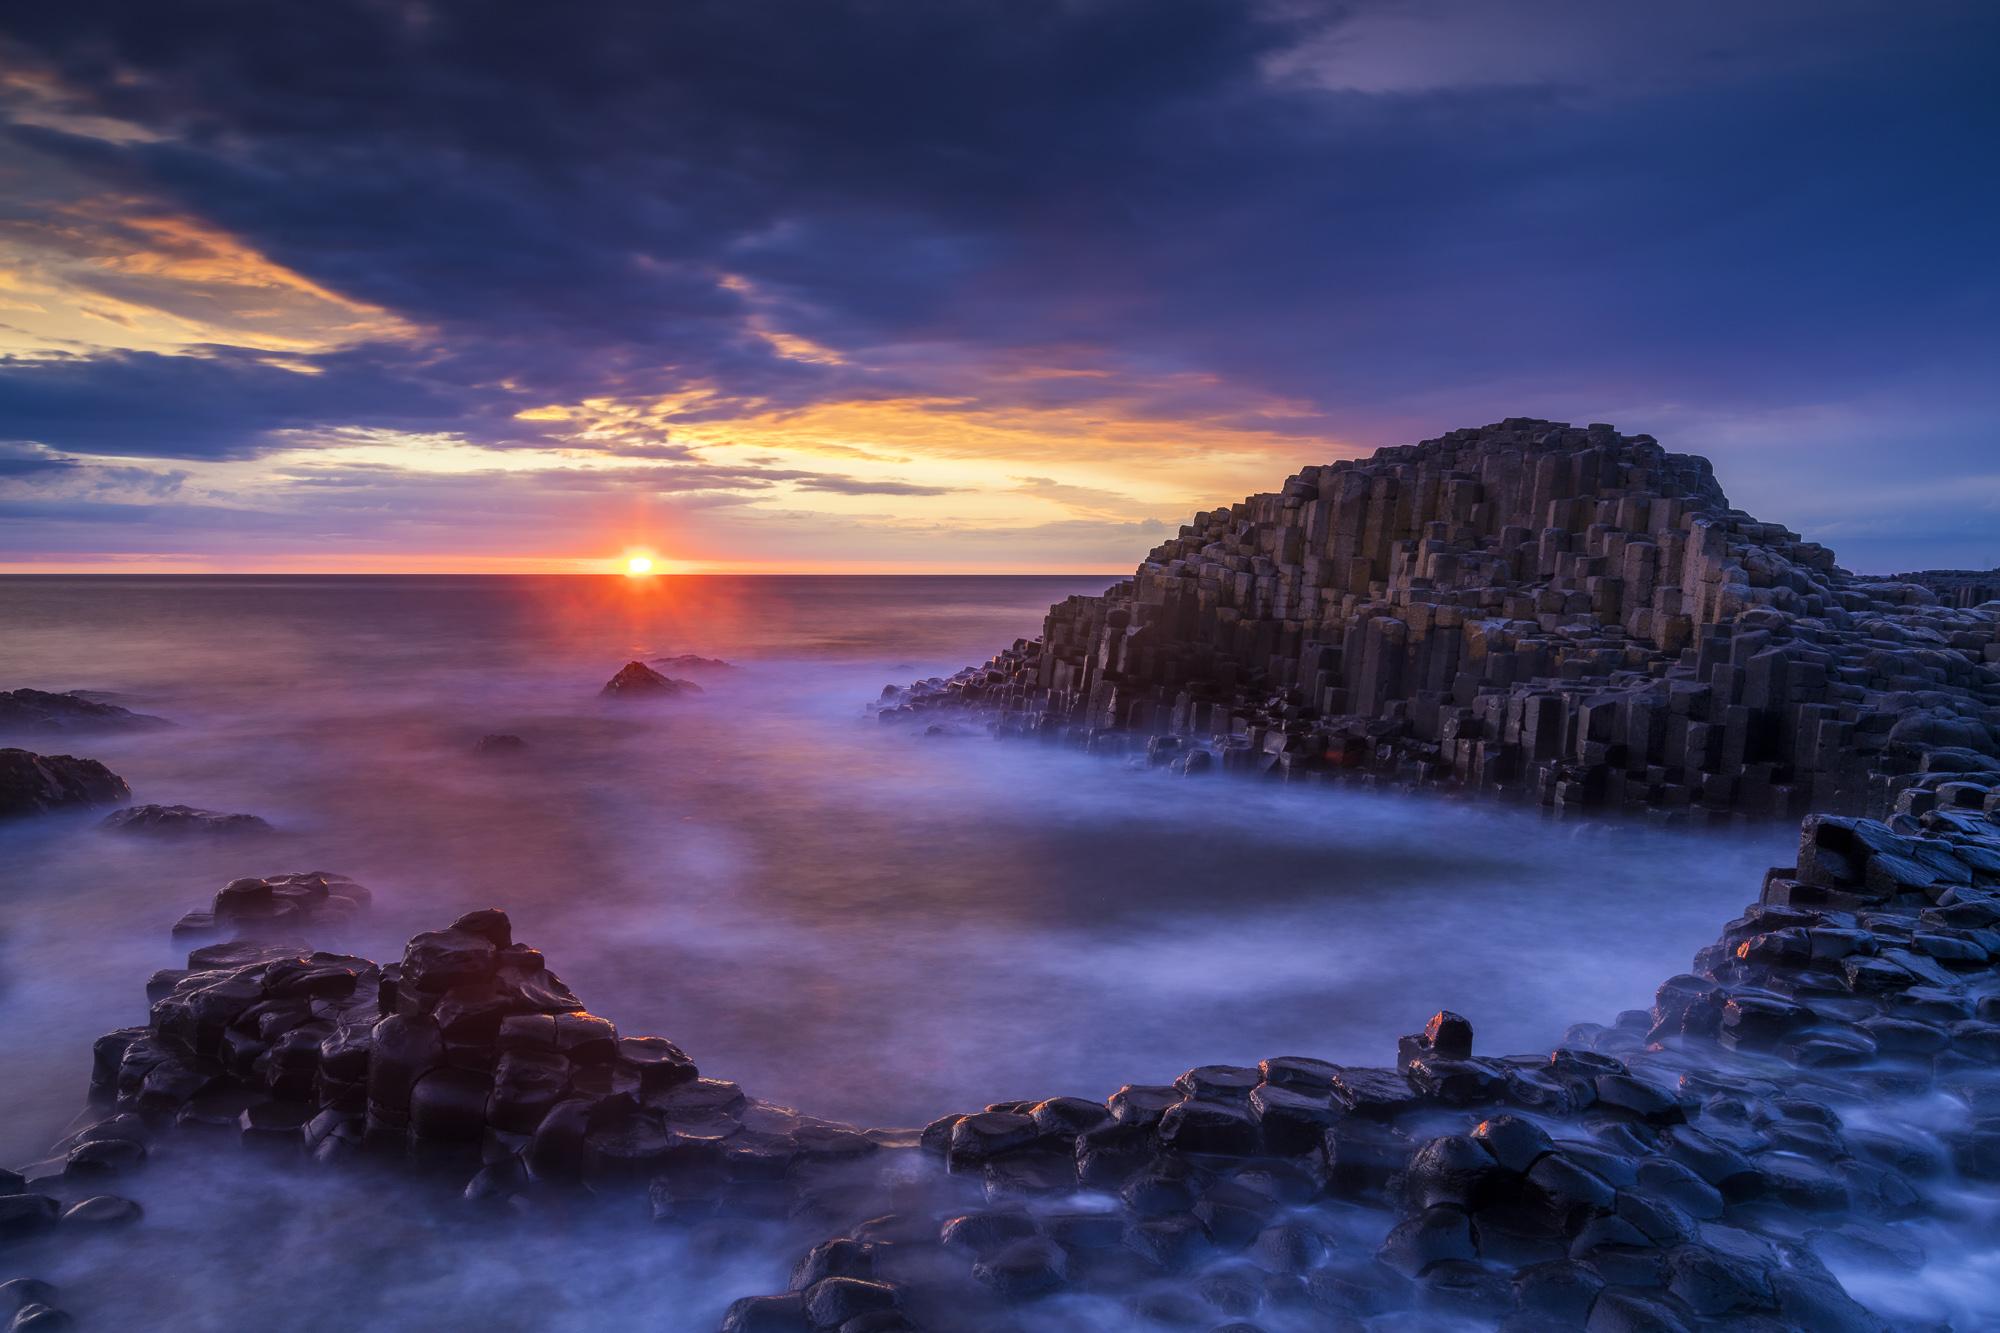 Giant's Causeway at Sunset, Co. Antrim, Northern Ireland